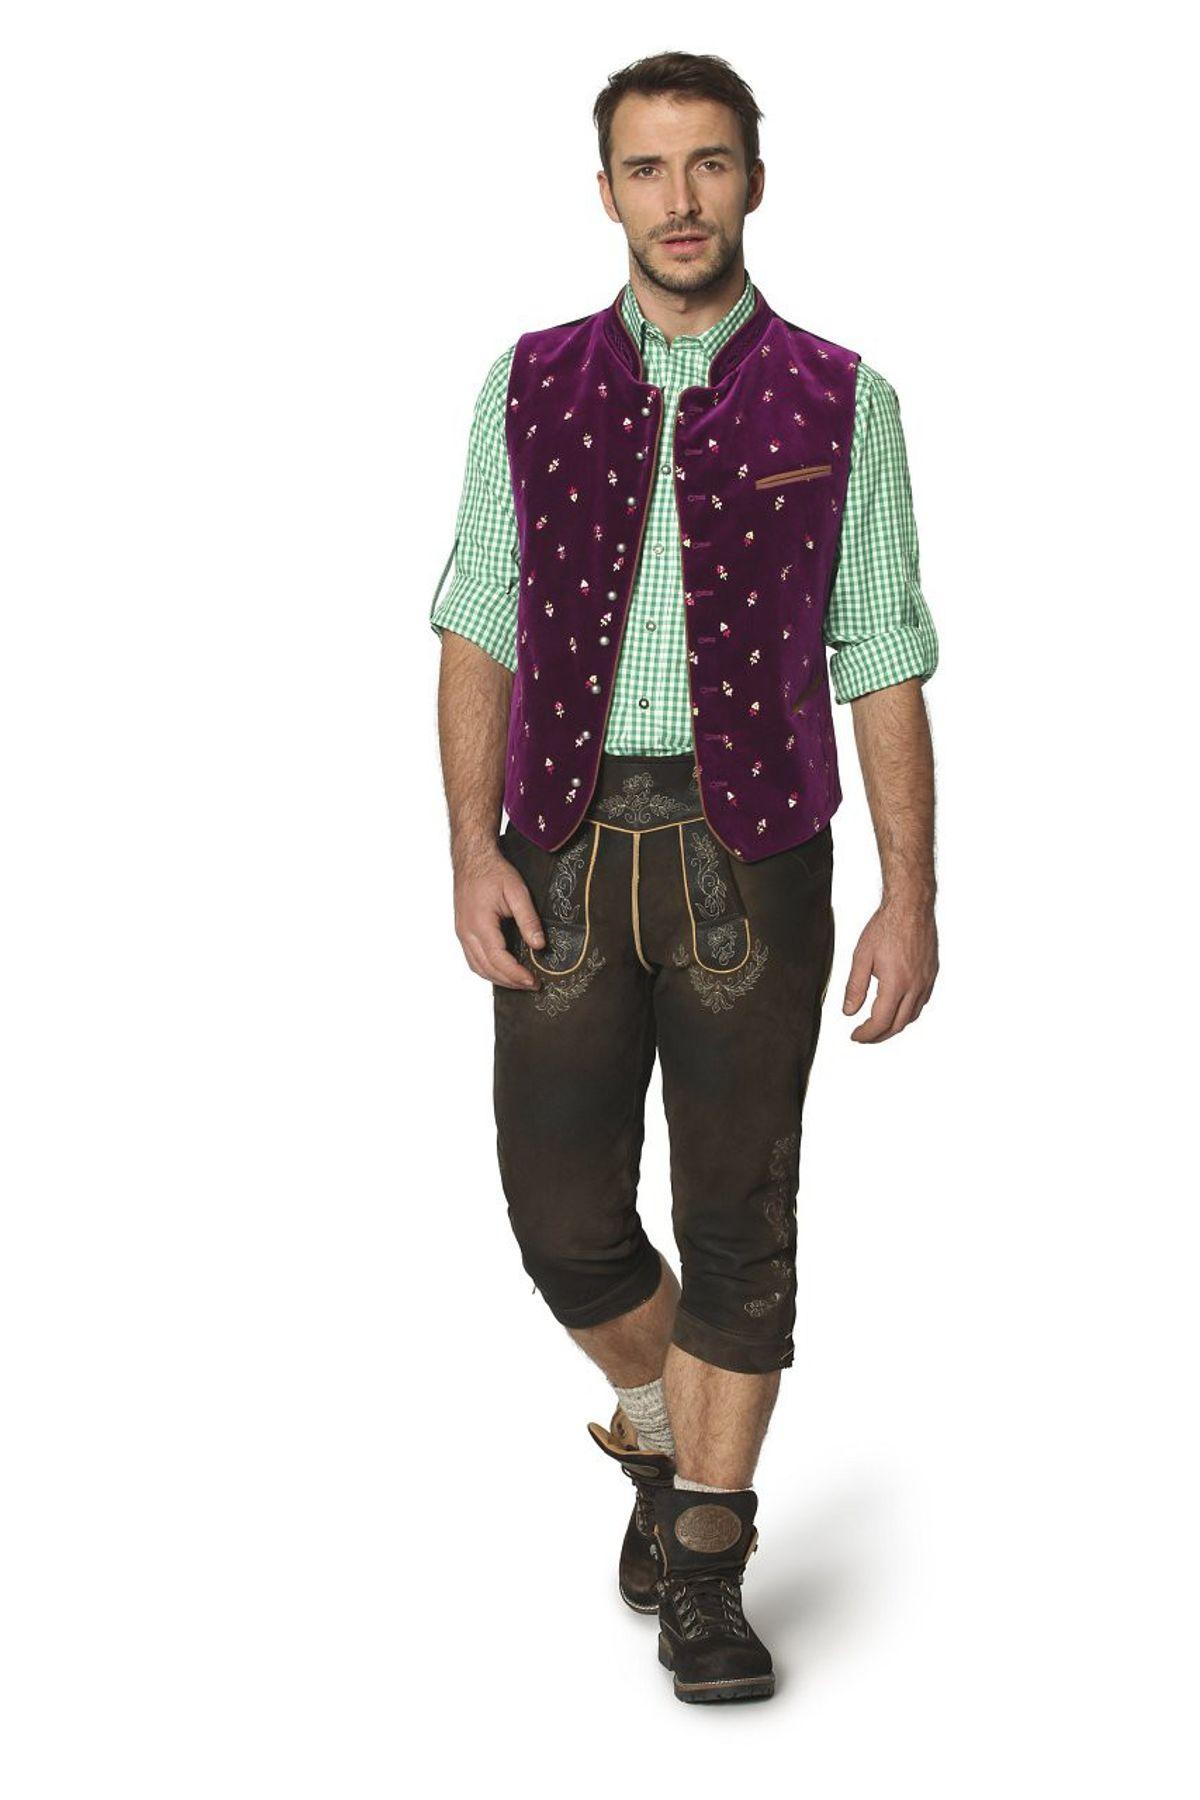 Stockerpoint - Herren Trachten Weste in verschiedenen Farbtönen, Calzado – Bild 21